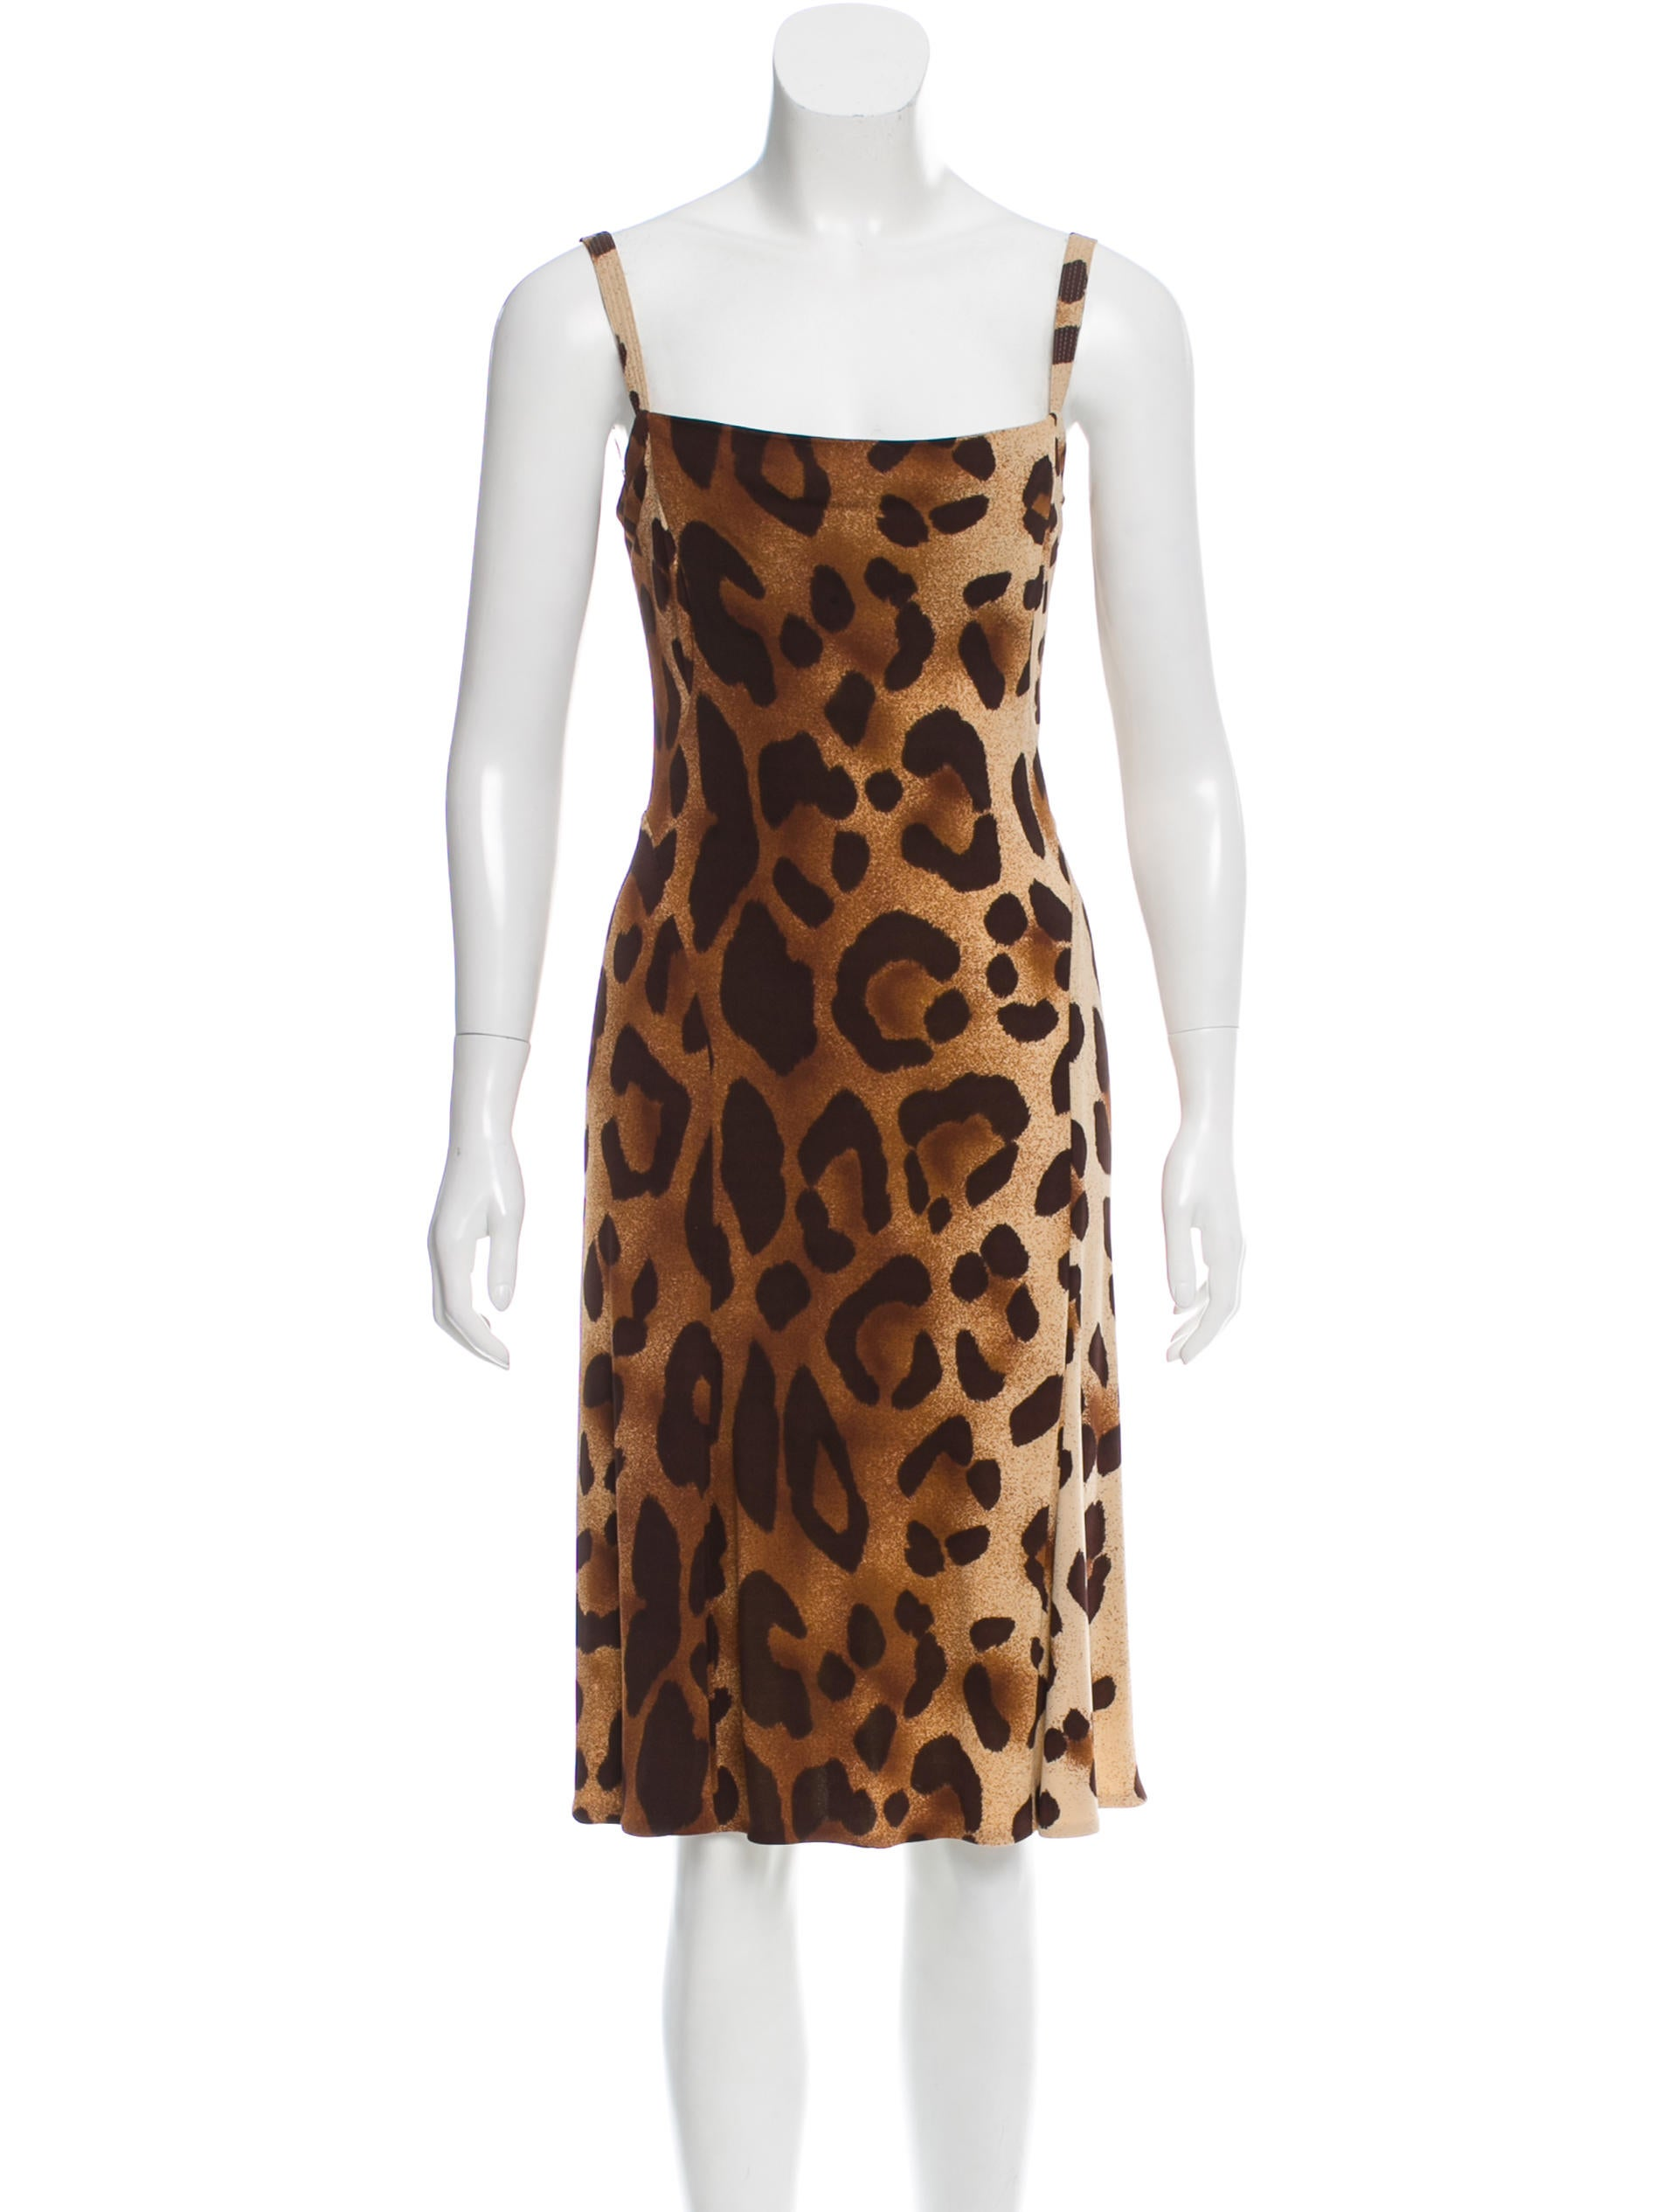 Gianni Versace Leopard Print Midi Dress Clothing